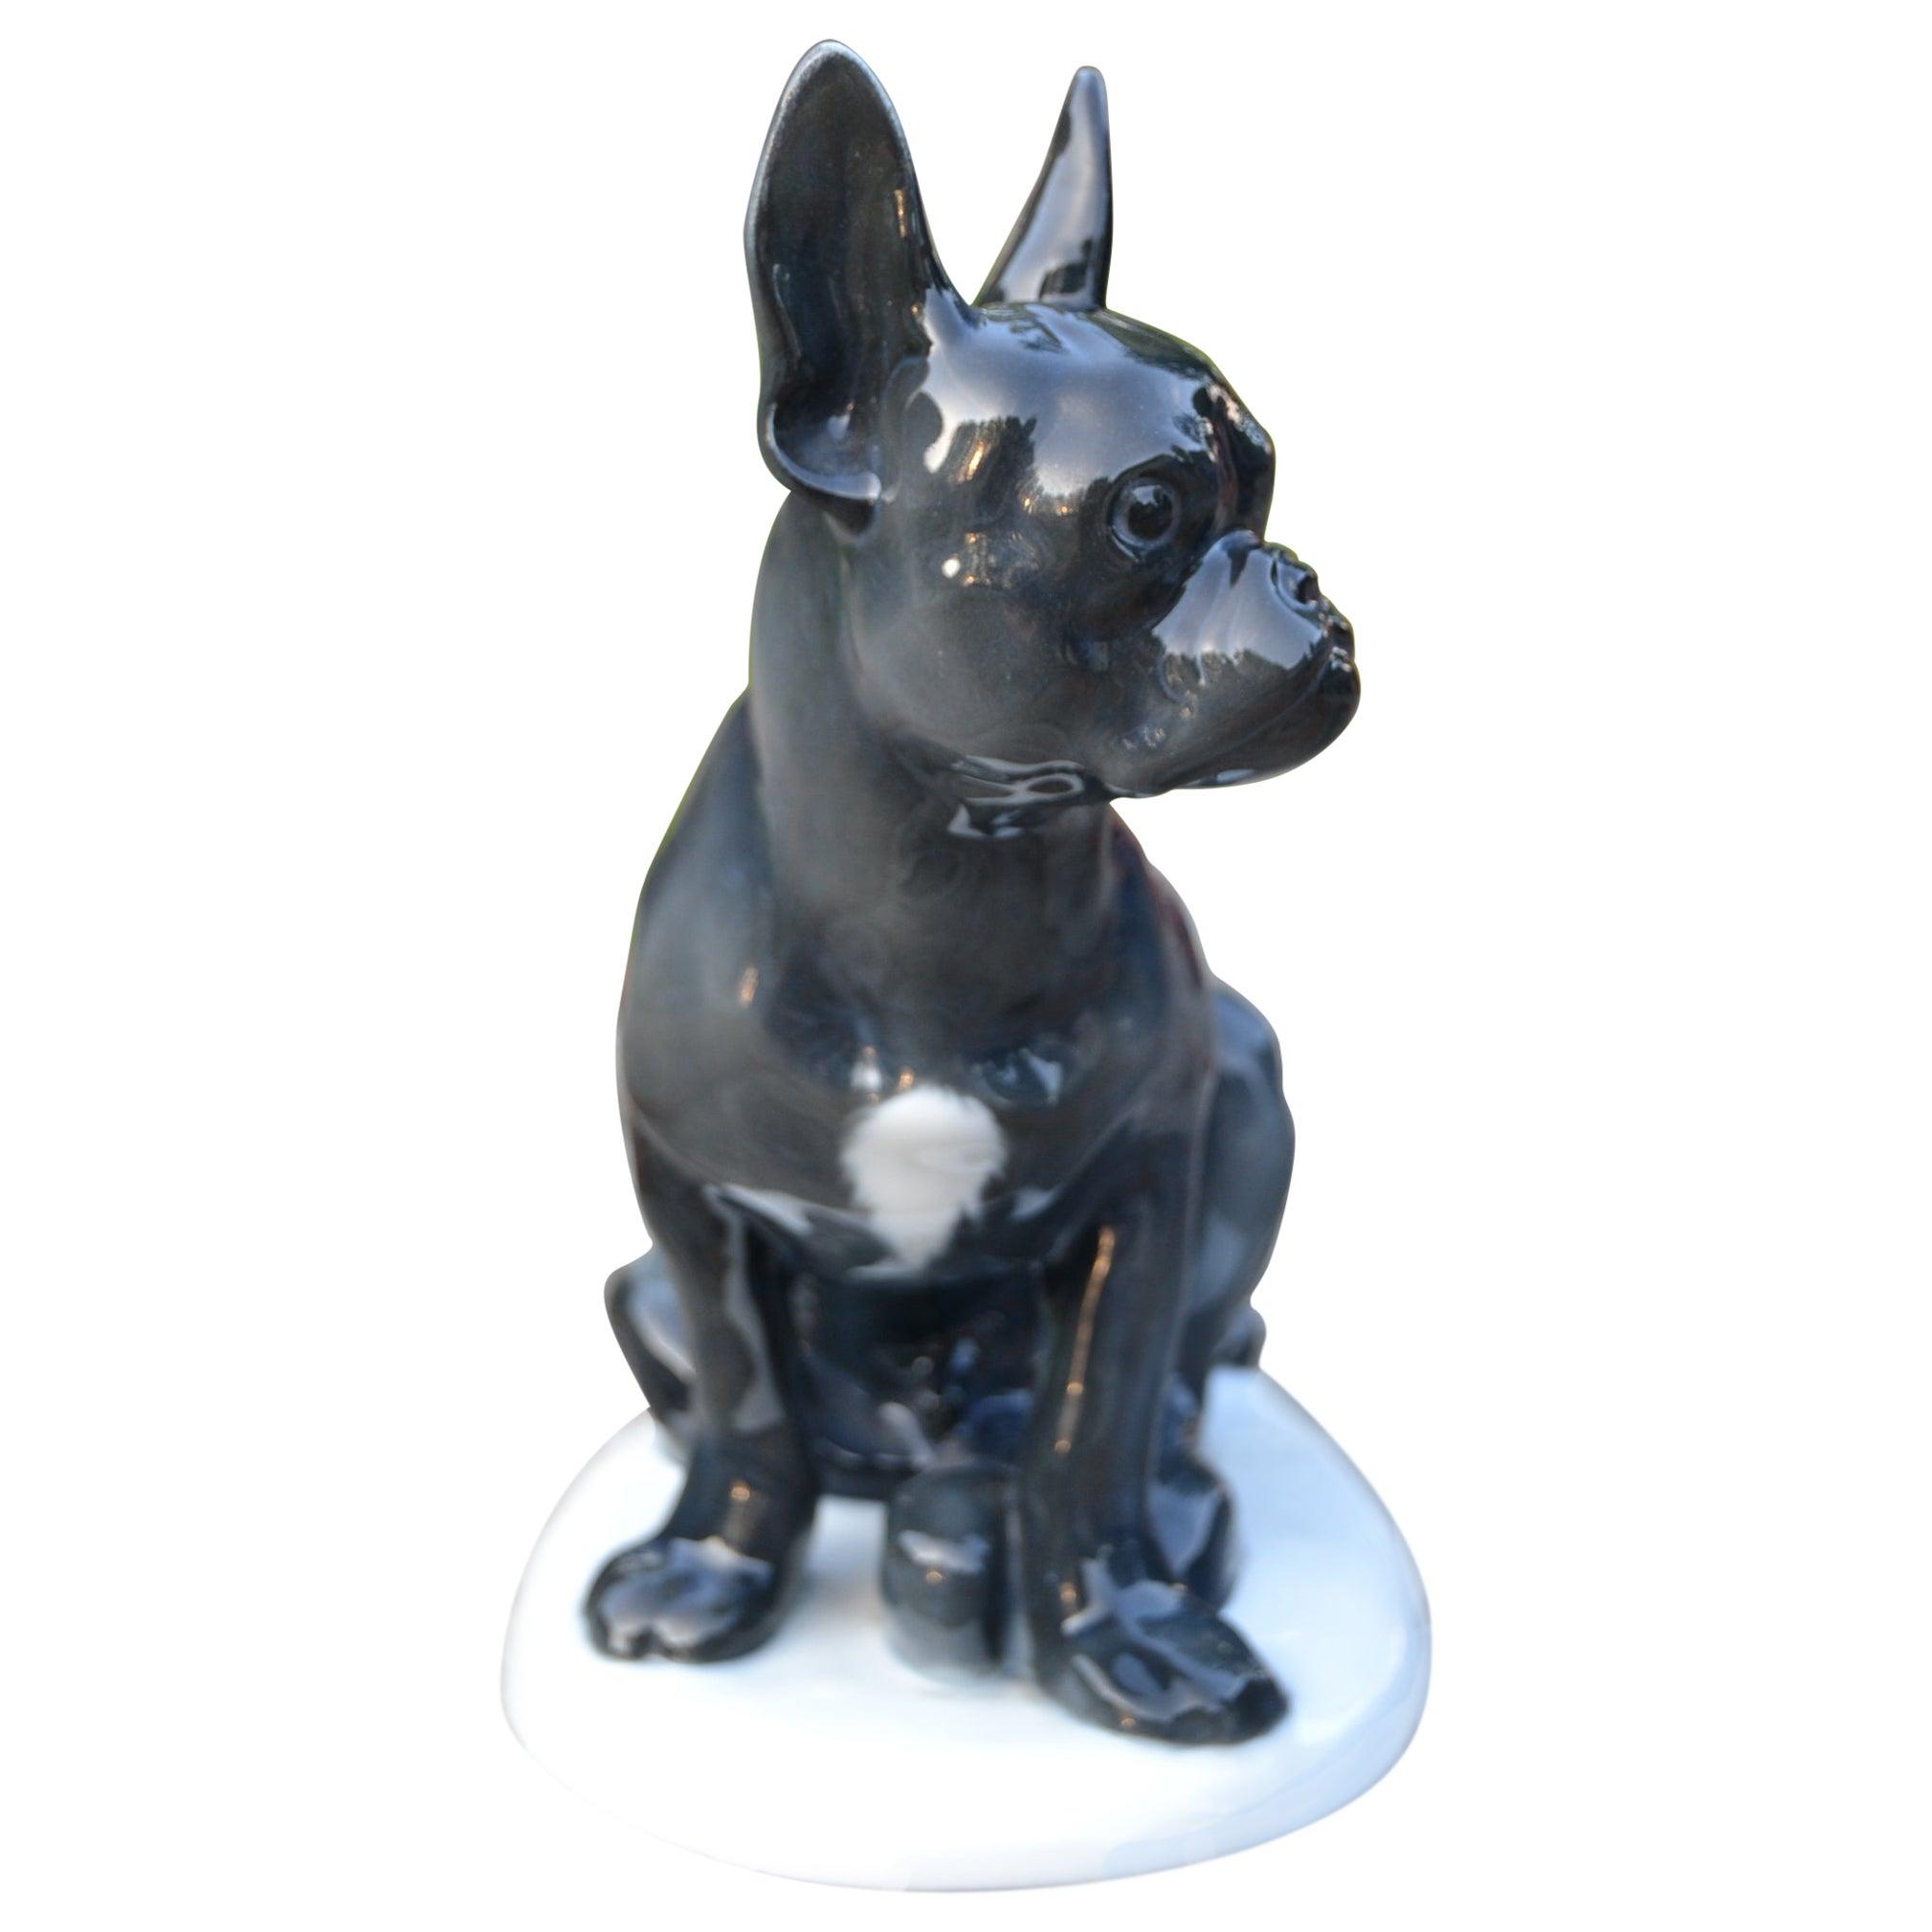 Art Deco Porcelain French Bulldog by Otto Thiem, Fraureuth Germany, 1920s